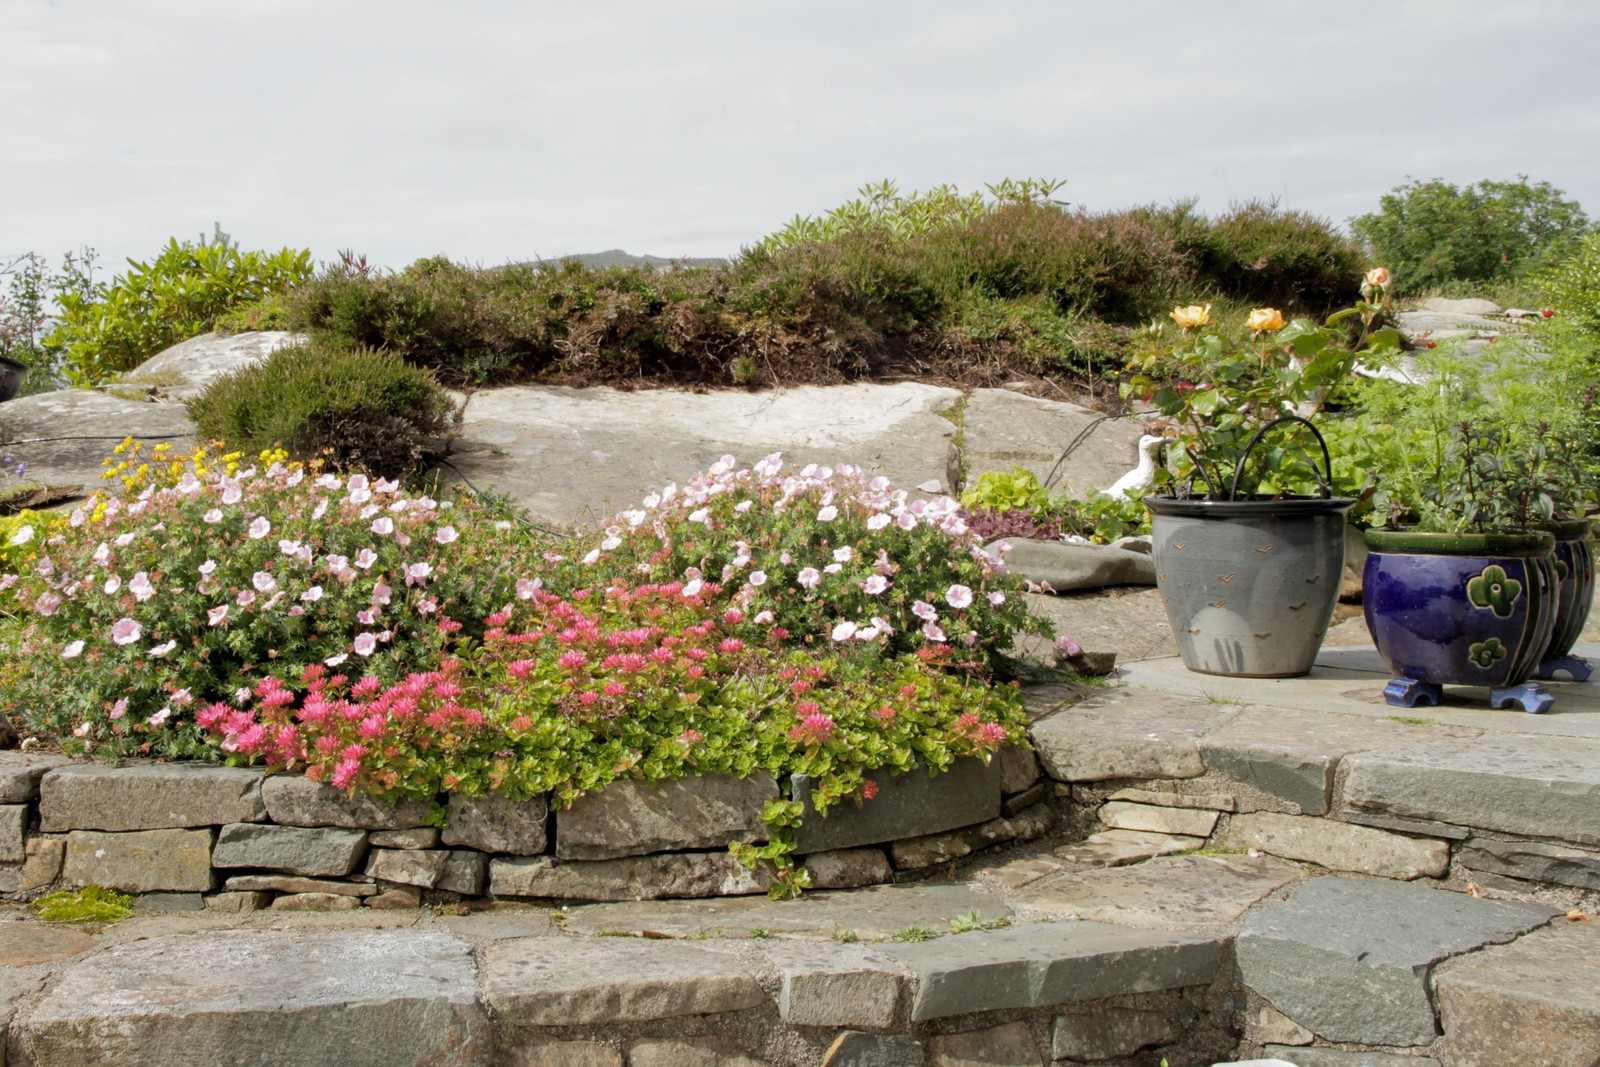 Mellom berg og stein har paret bygd hagen i trapper.